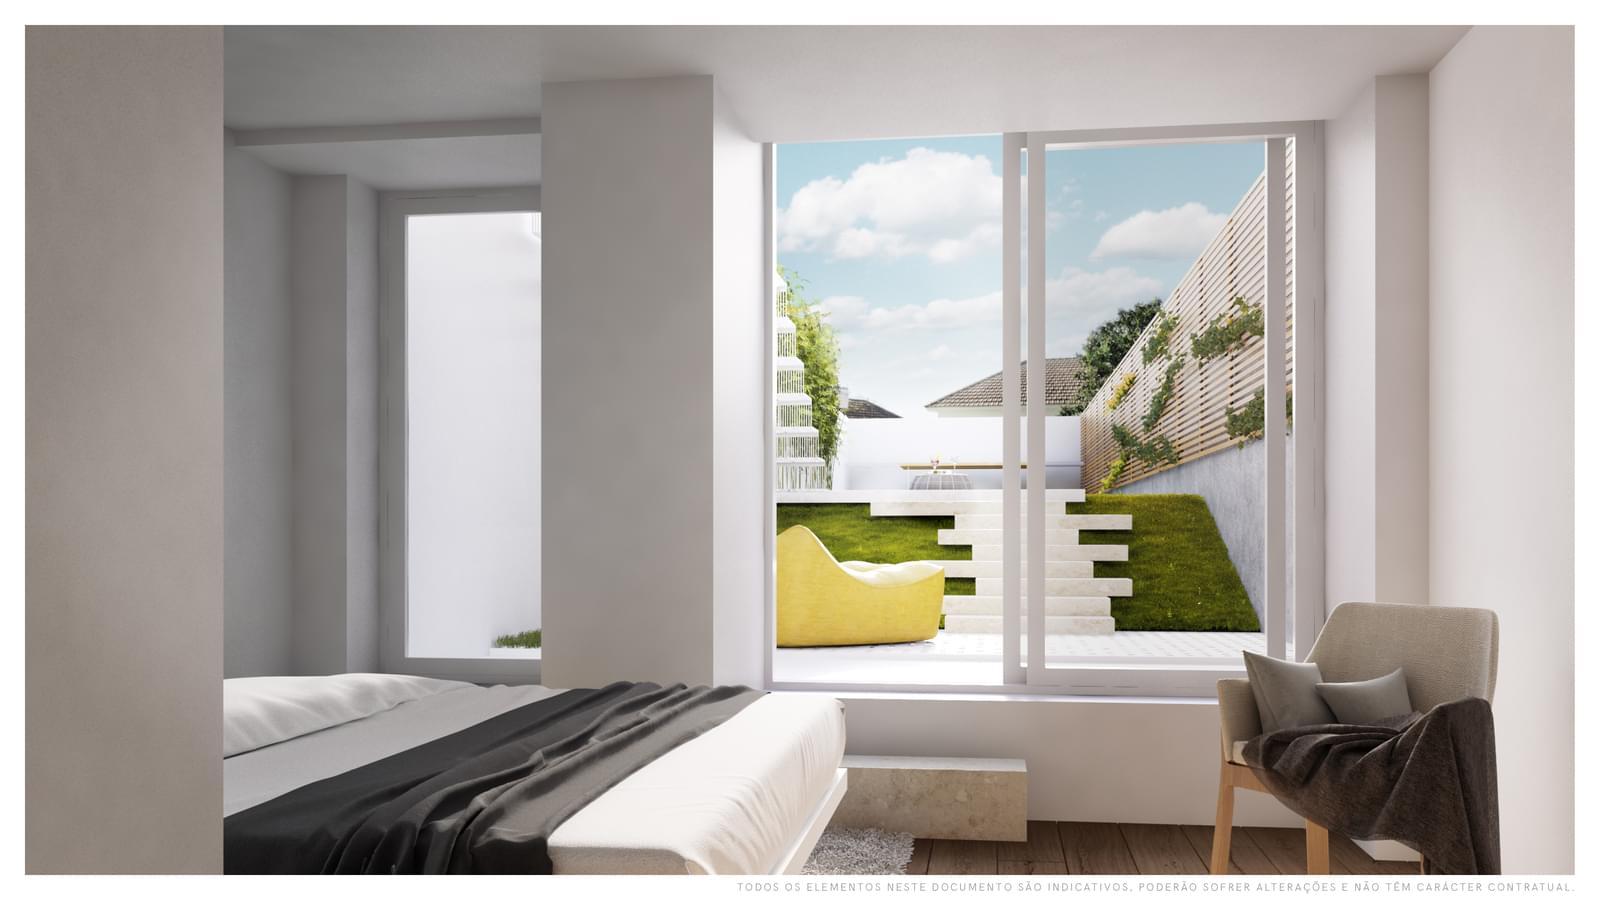 pf17324-apartamento-t2-lisboa-e57f8e24-827f-4897-80a8-c1922b52d83f